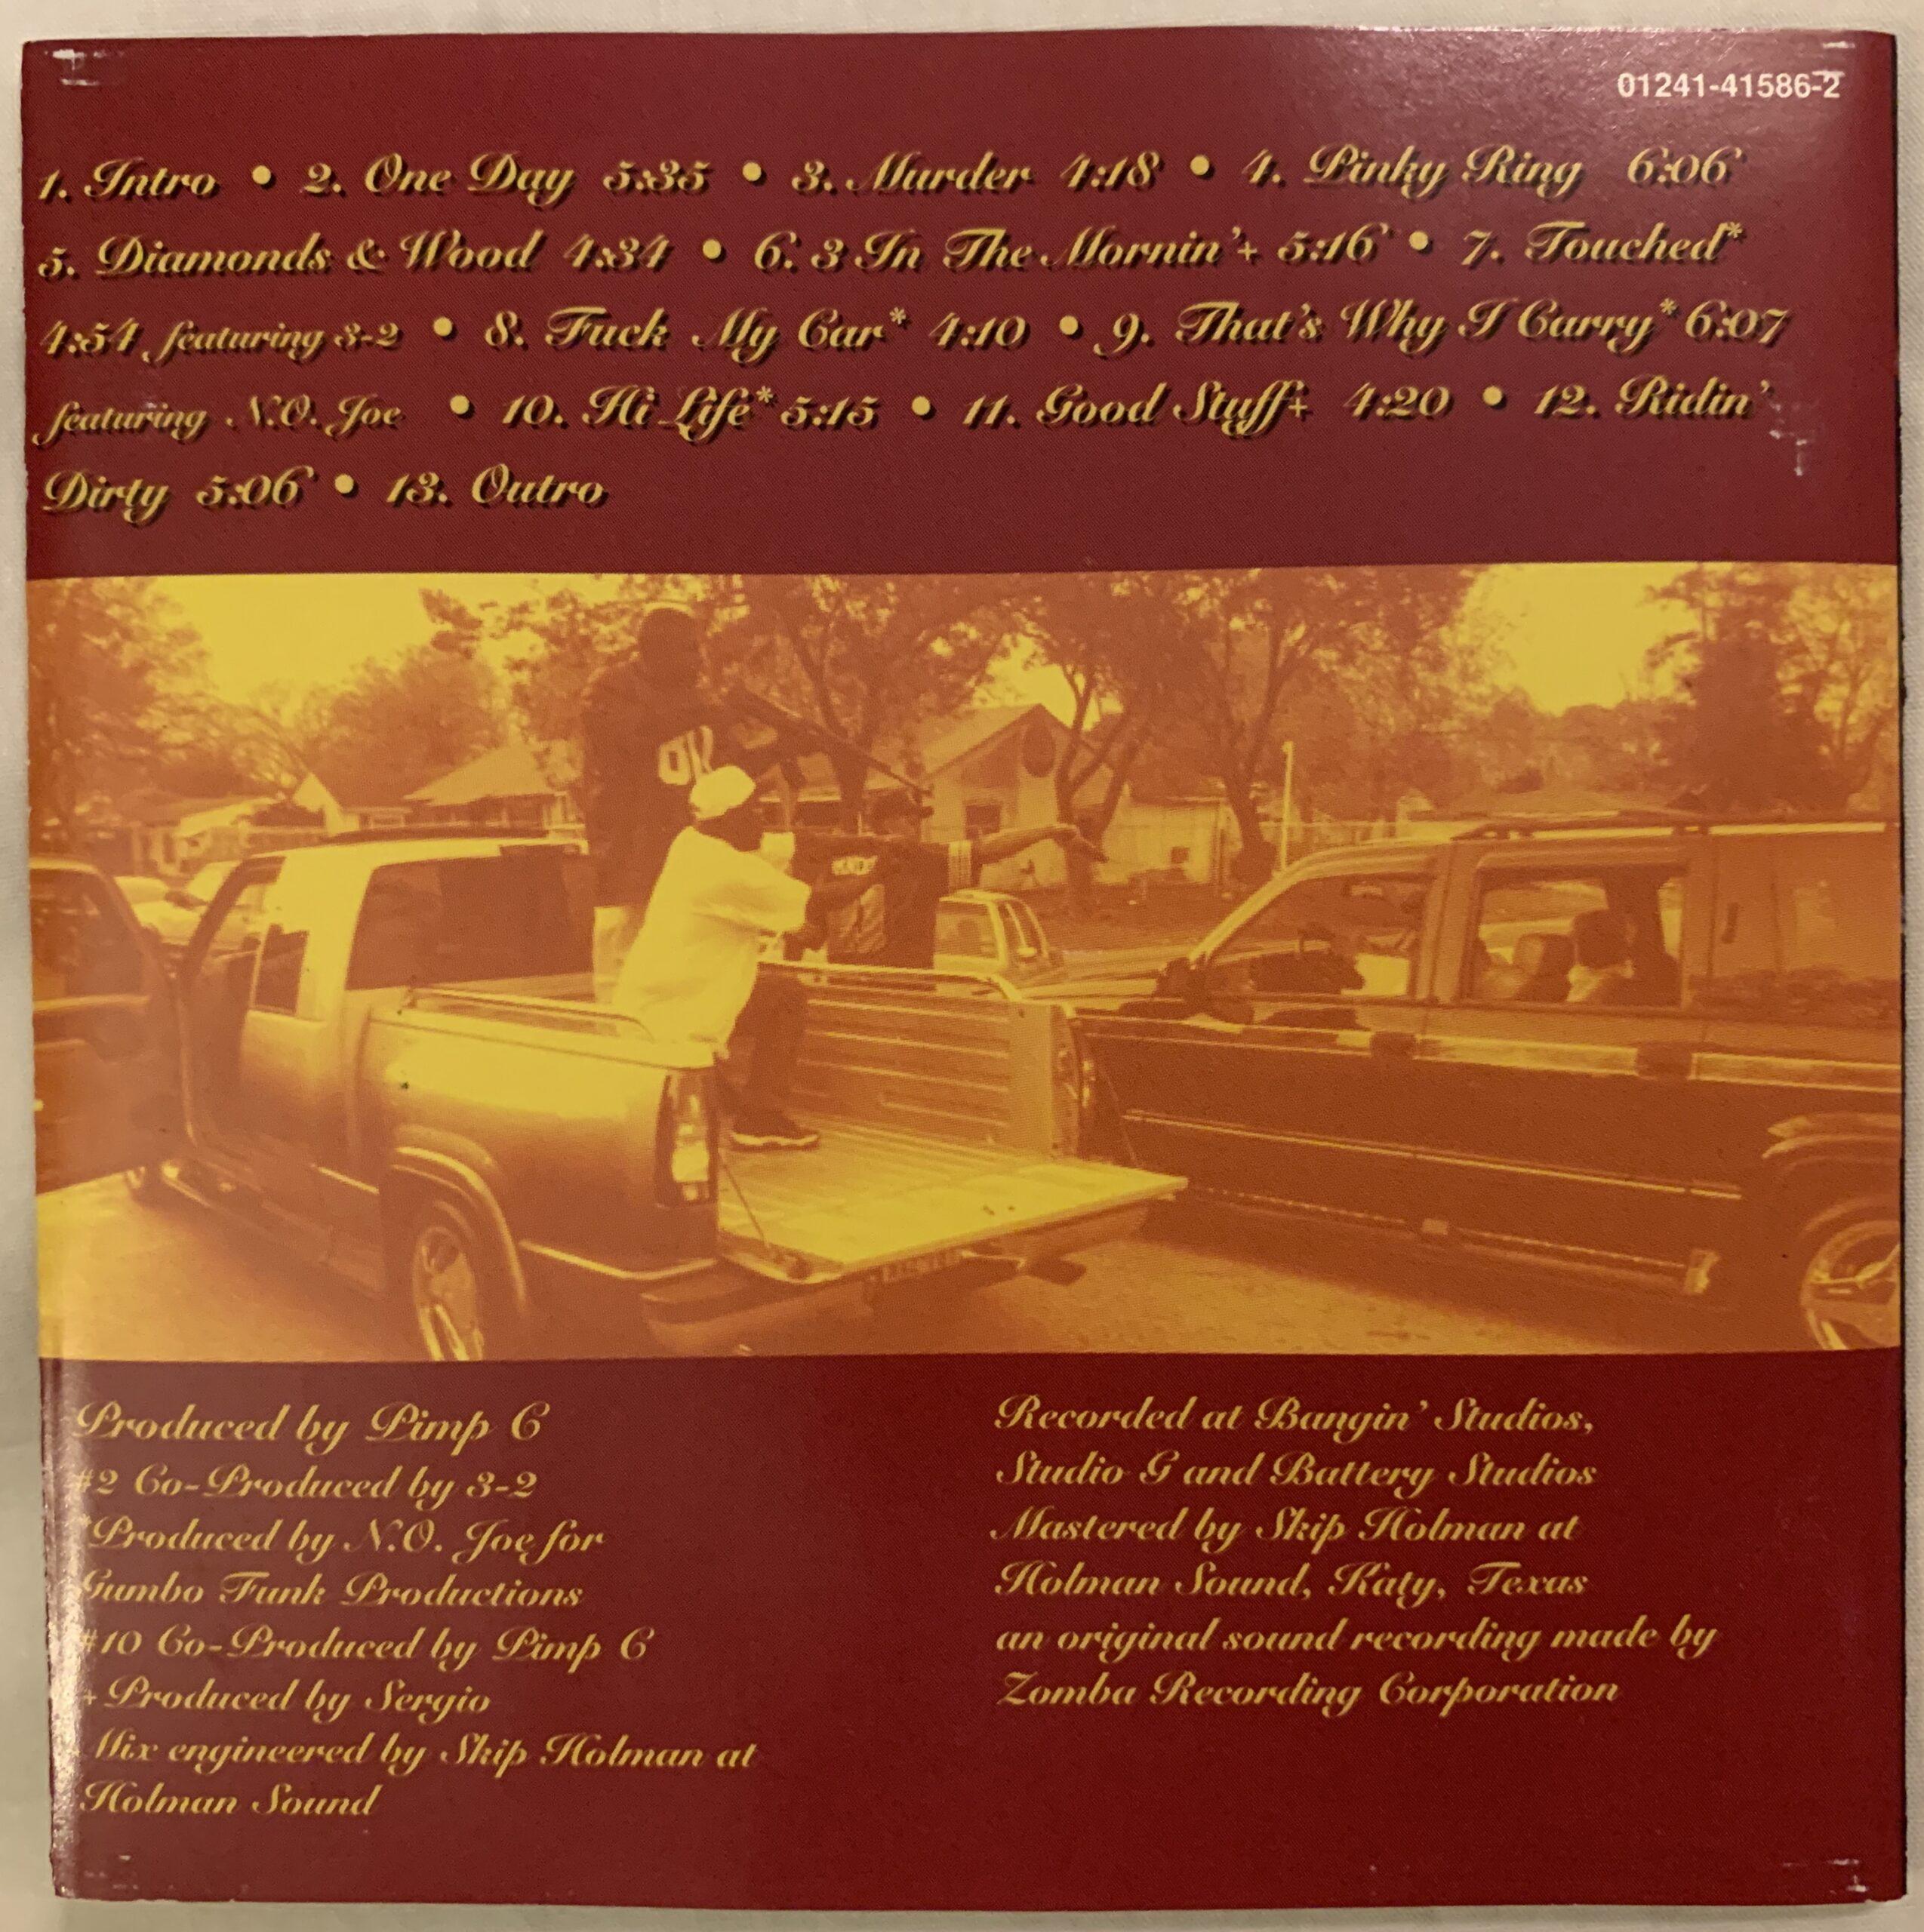 UGK Ridin Dirty CD booklet inside cover